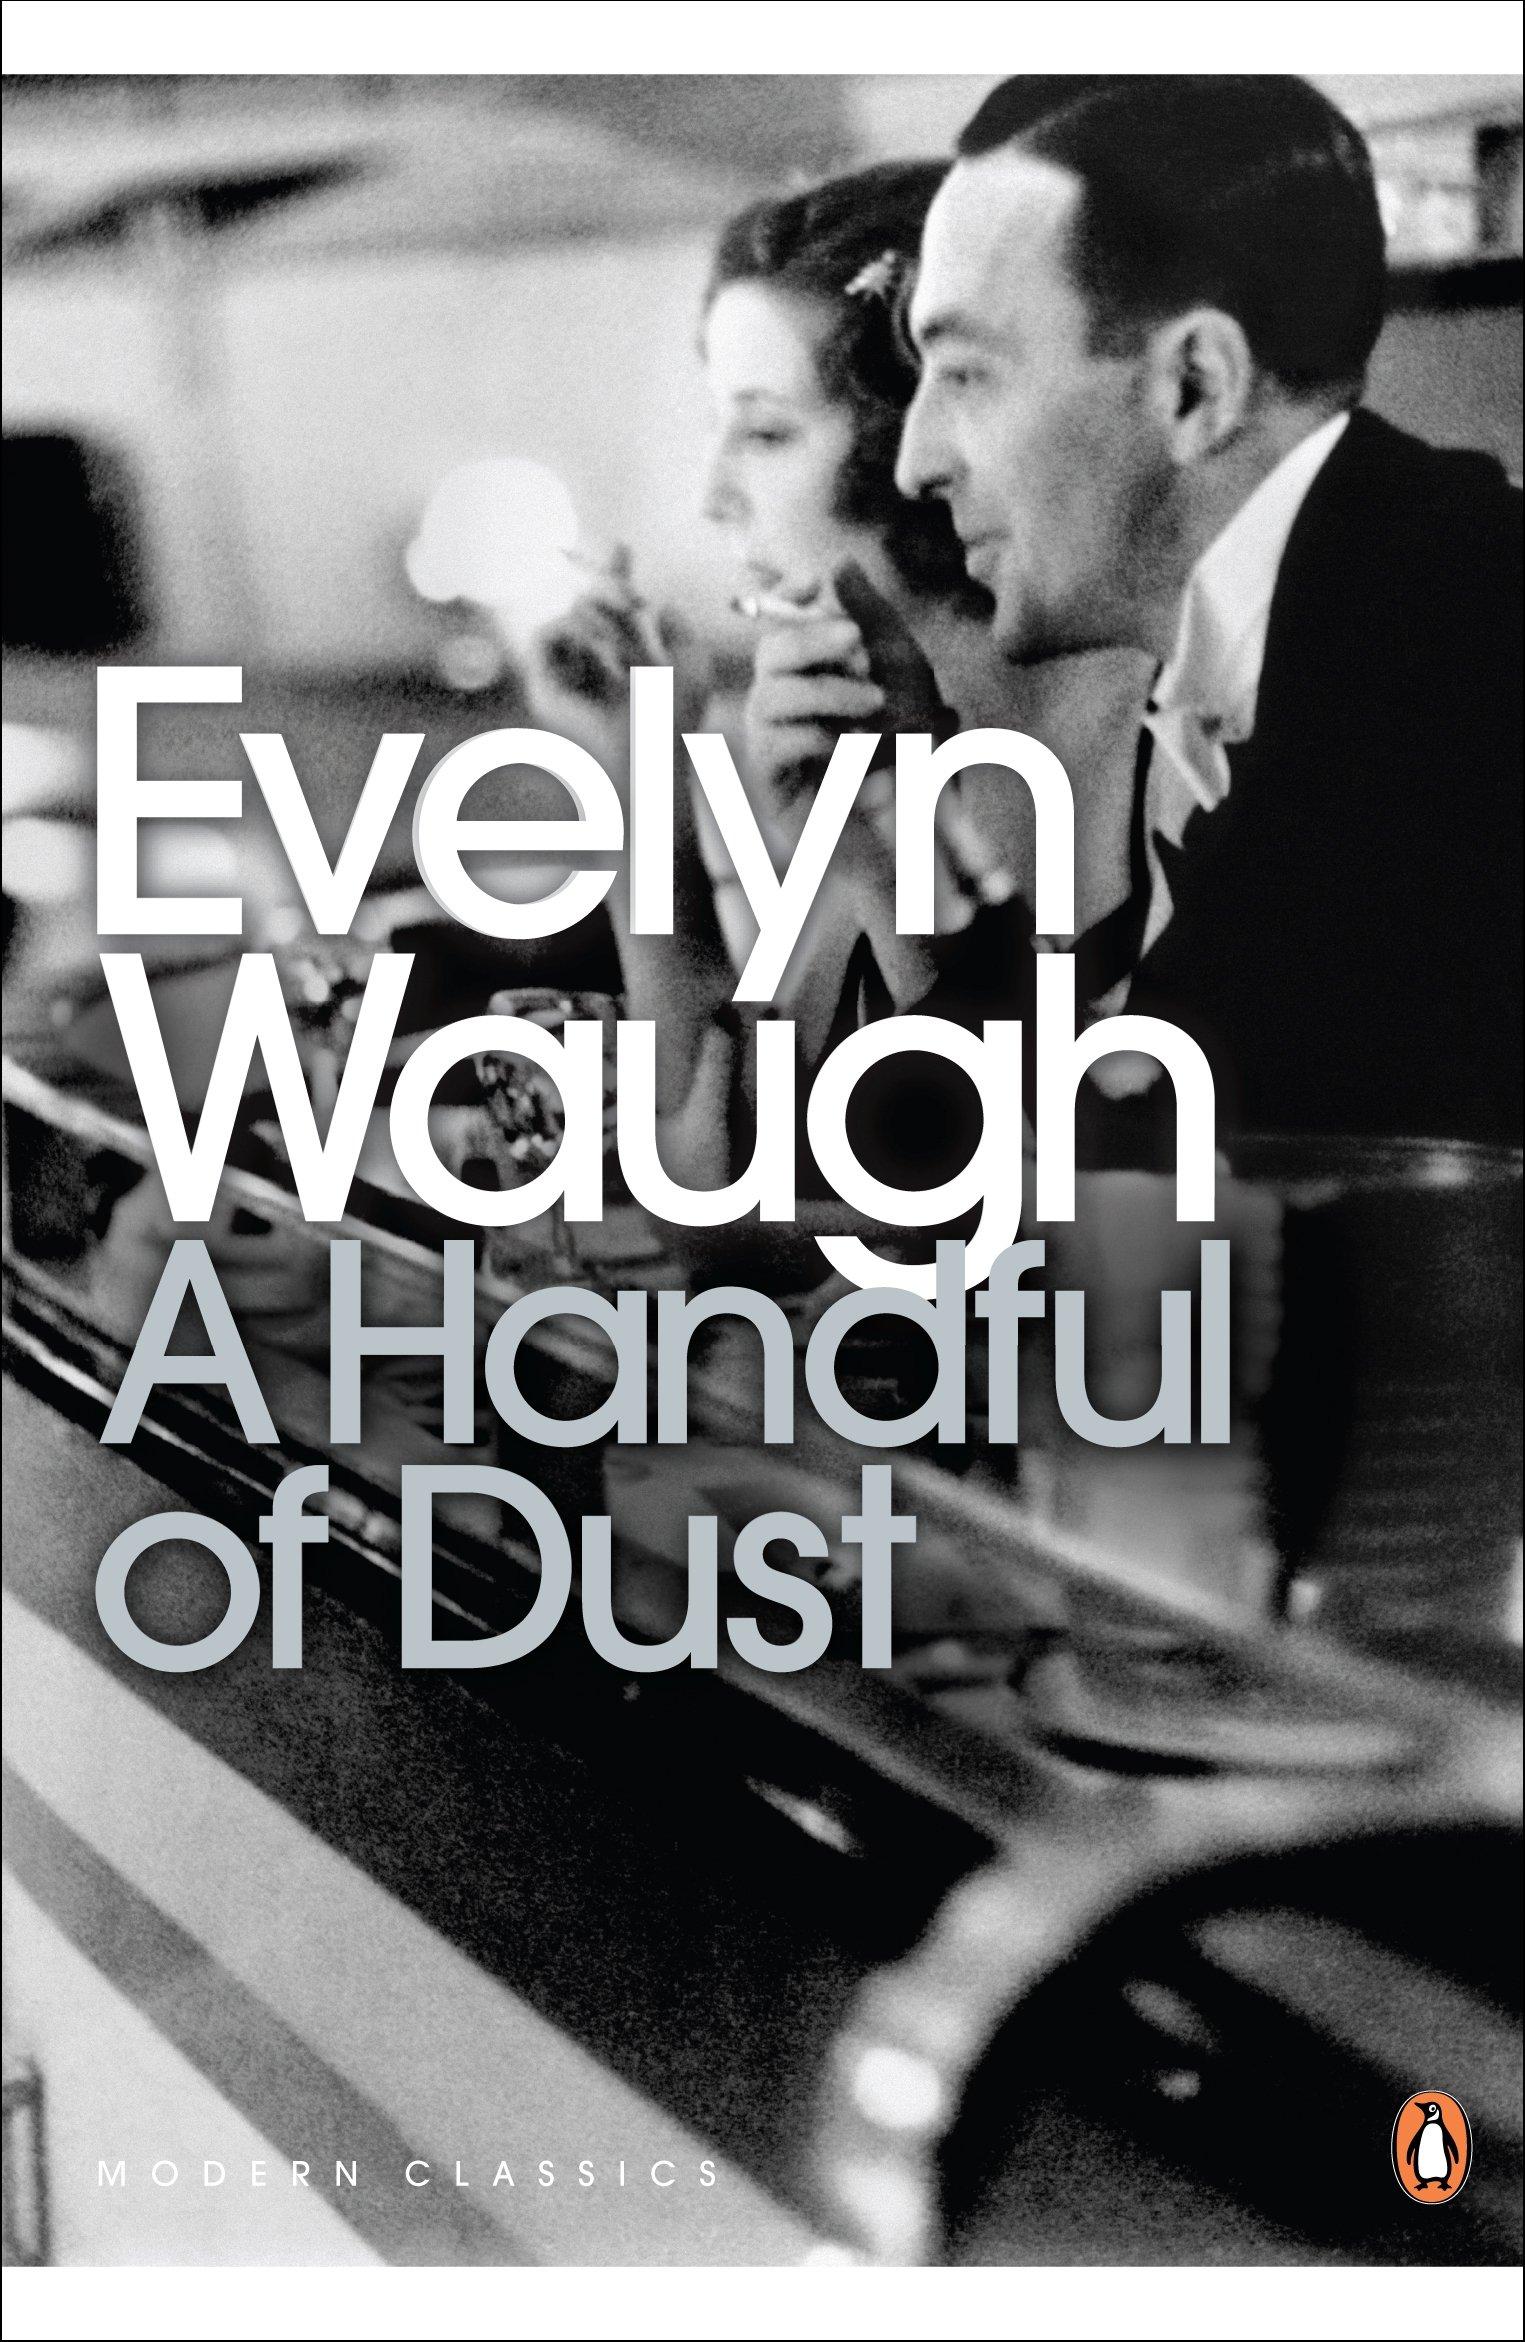 A Handful of Dust (Penguin Modern Classics): Amazon.co.uk: Evelyn Waugh: 9780141183961: Books